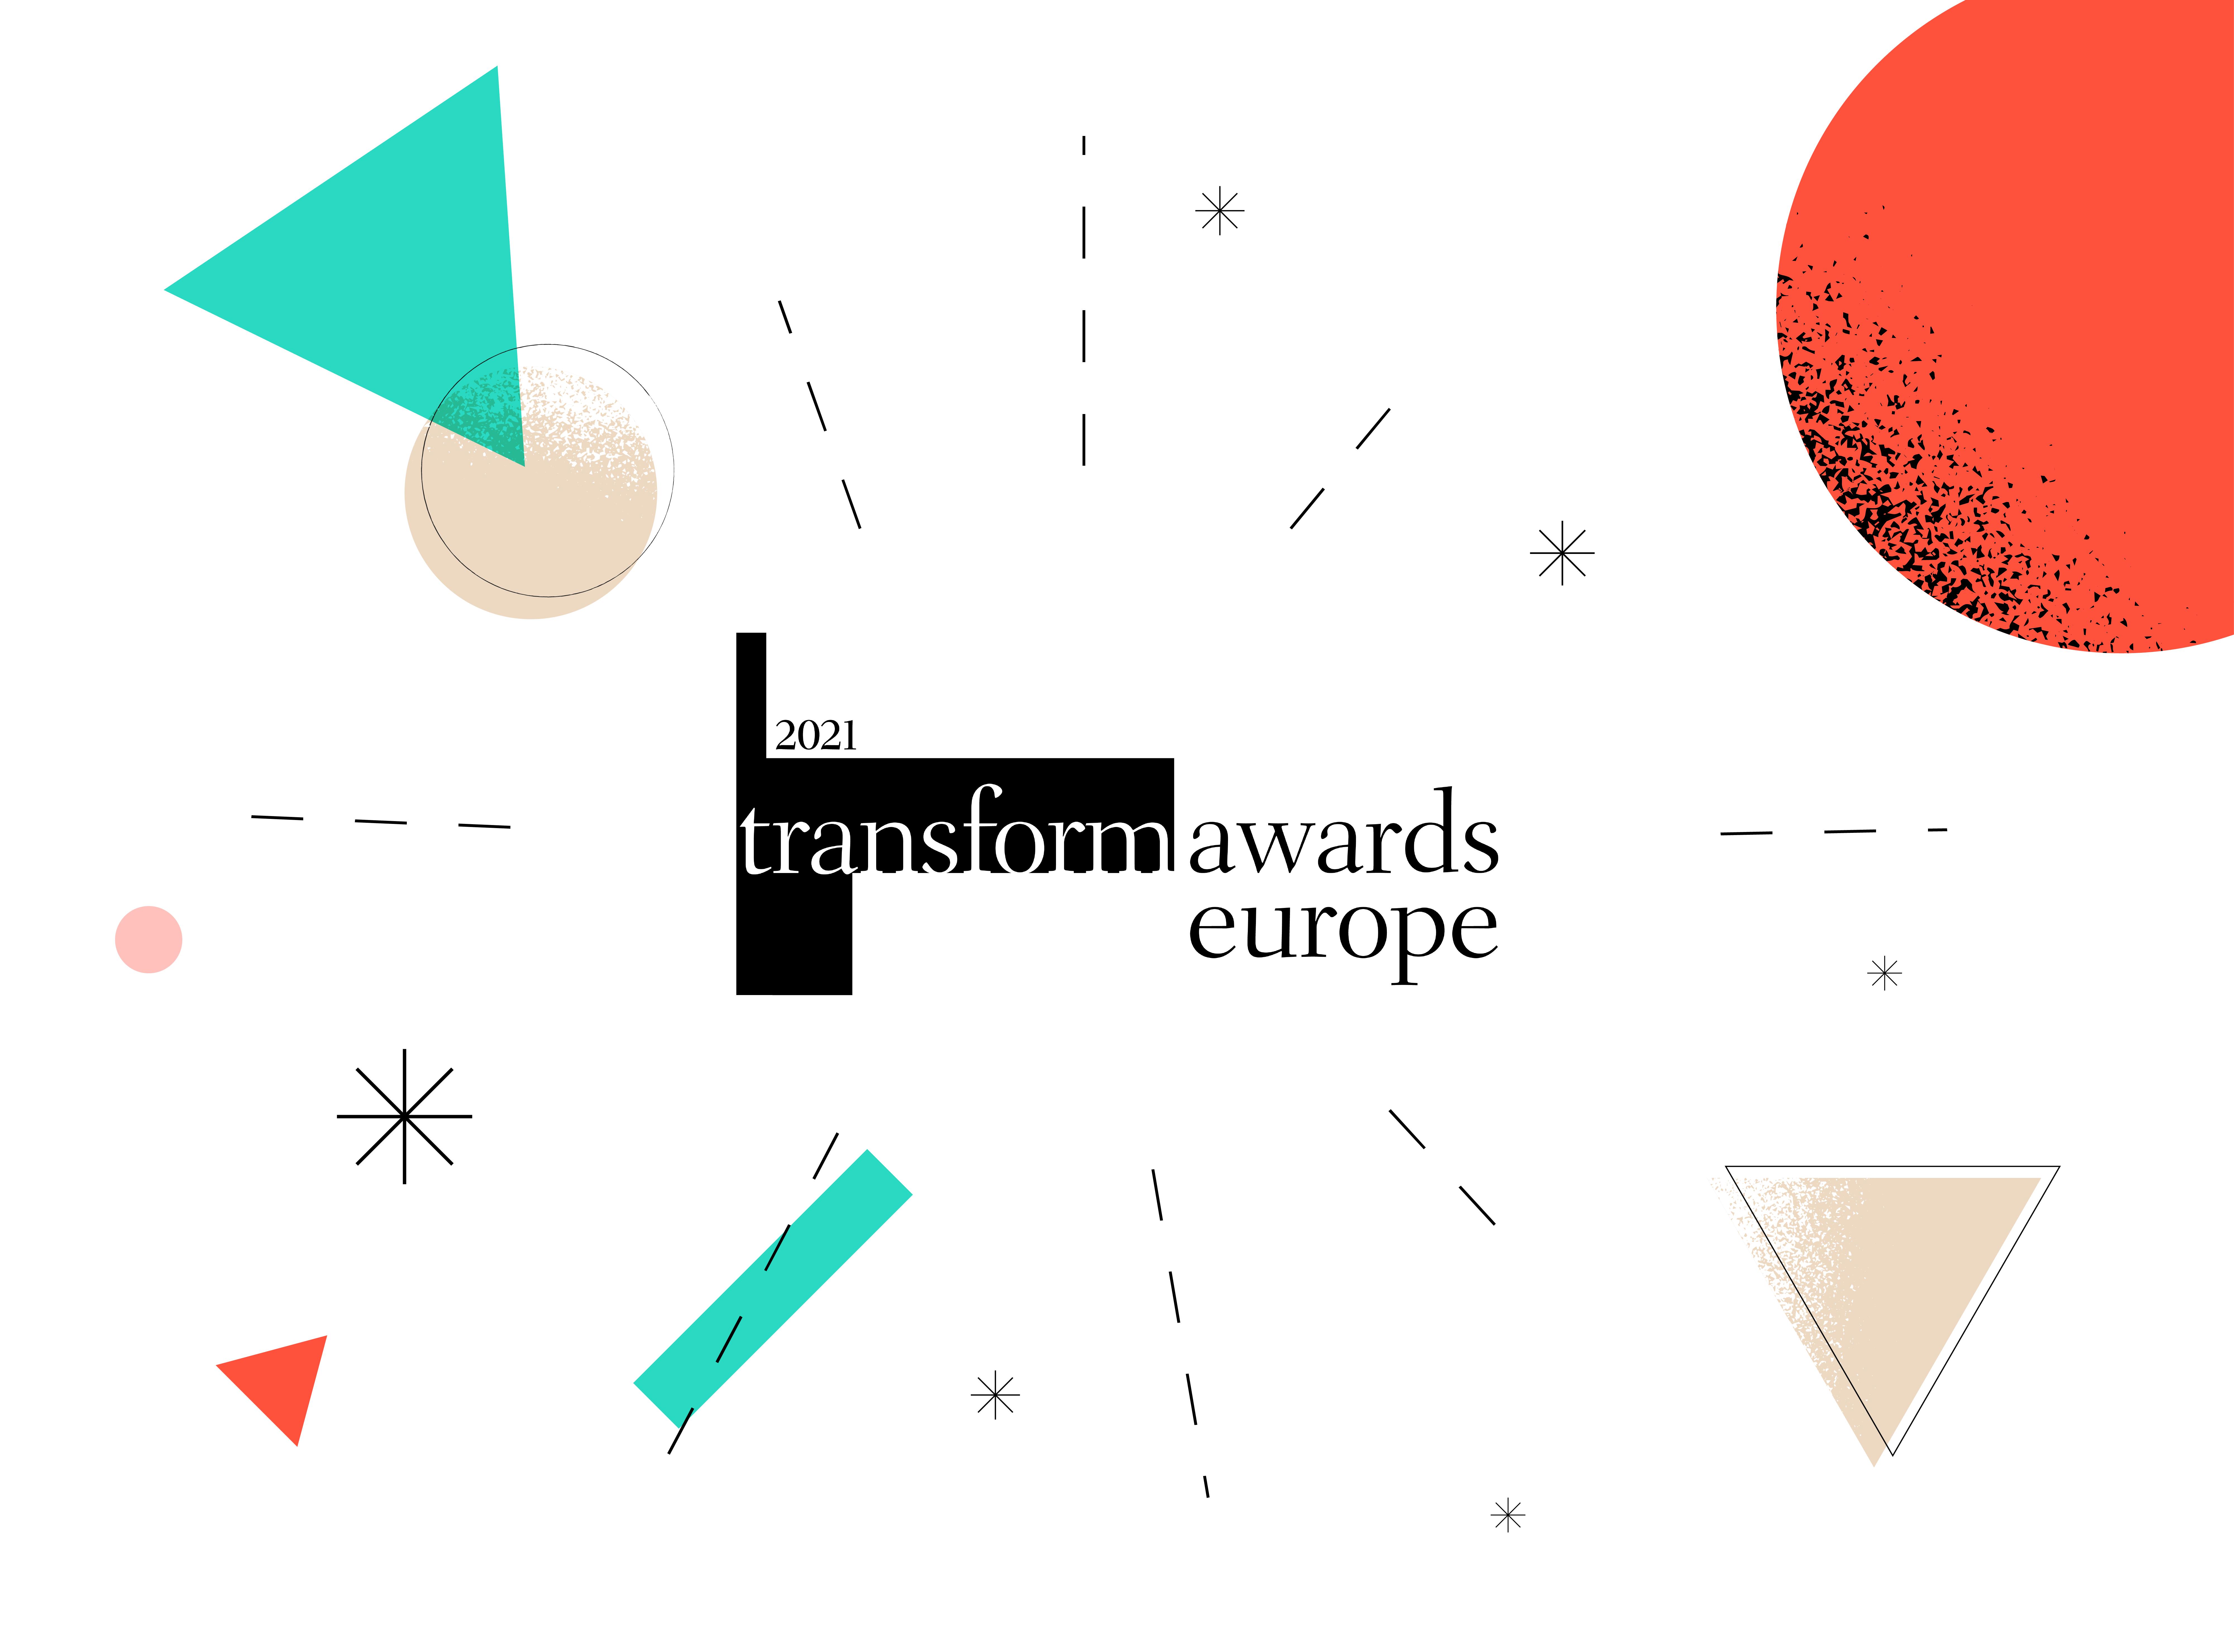 Transform Awards Europe 2021: Brand Advisory service for ABB